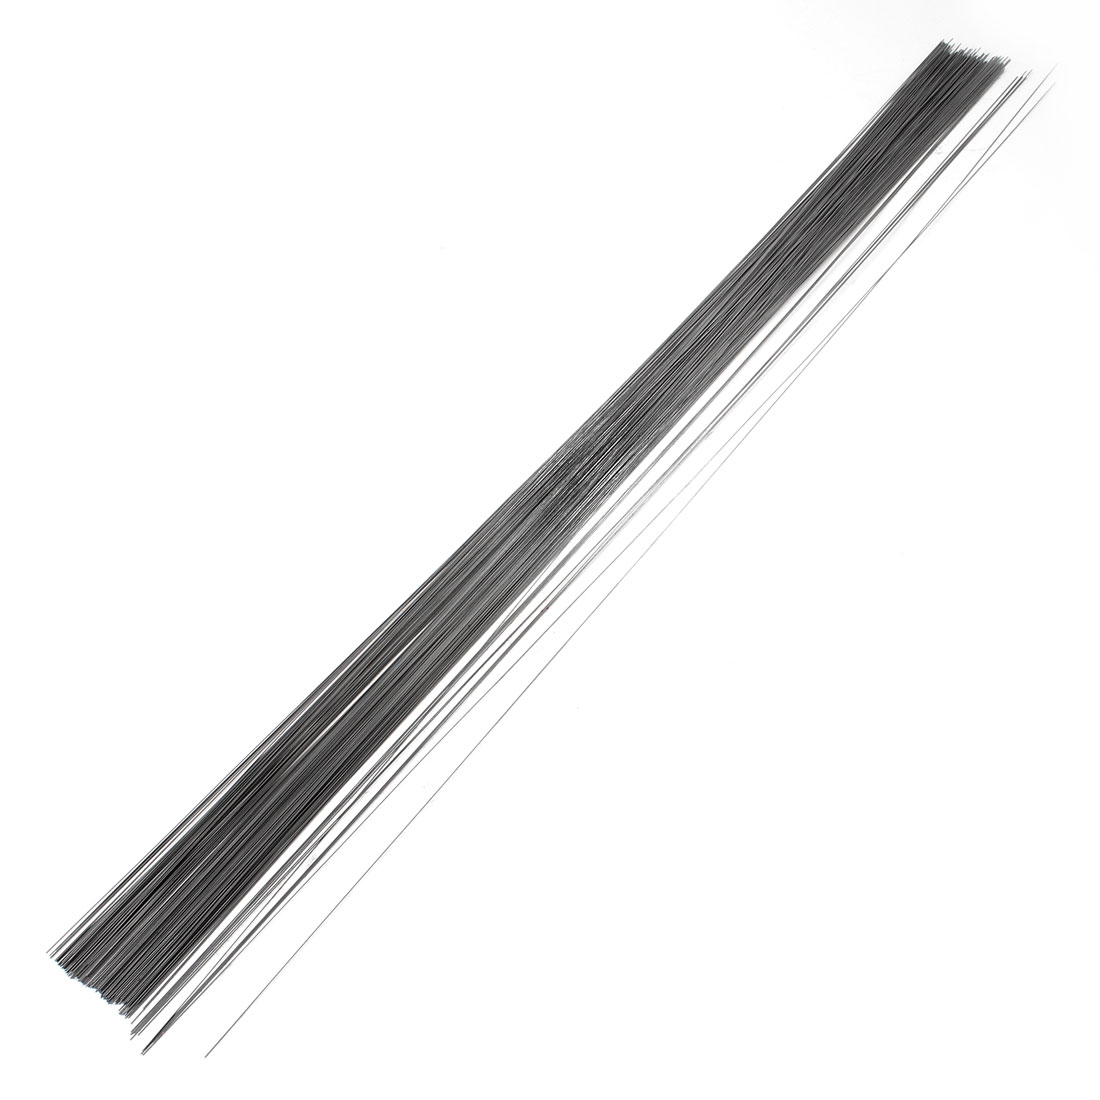 200 Pcs Cerium Tungsten Electrode TIG Welding 0.3mm x 500mm